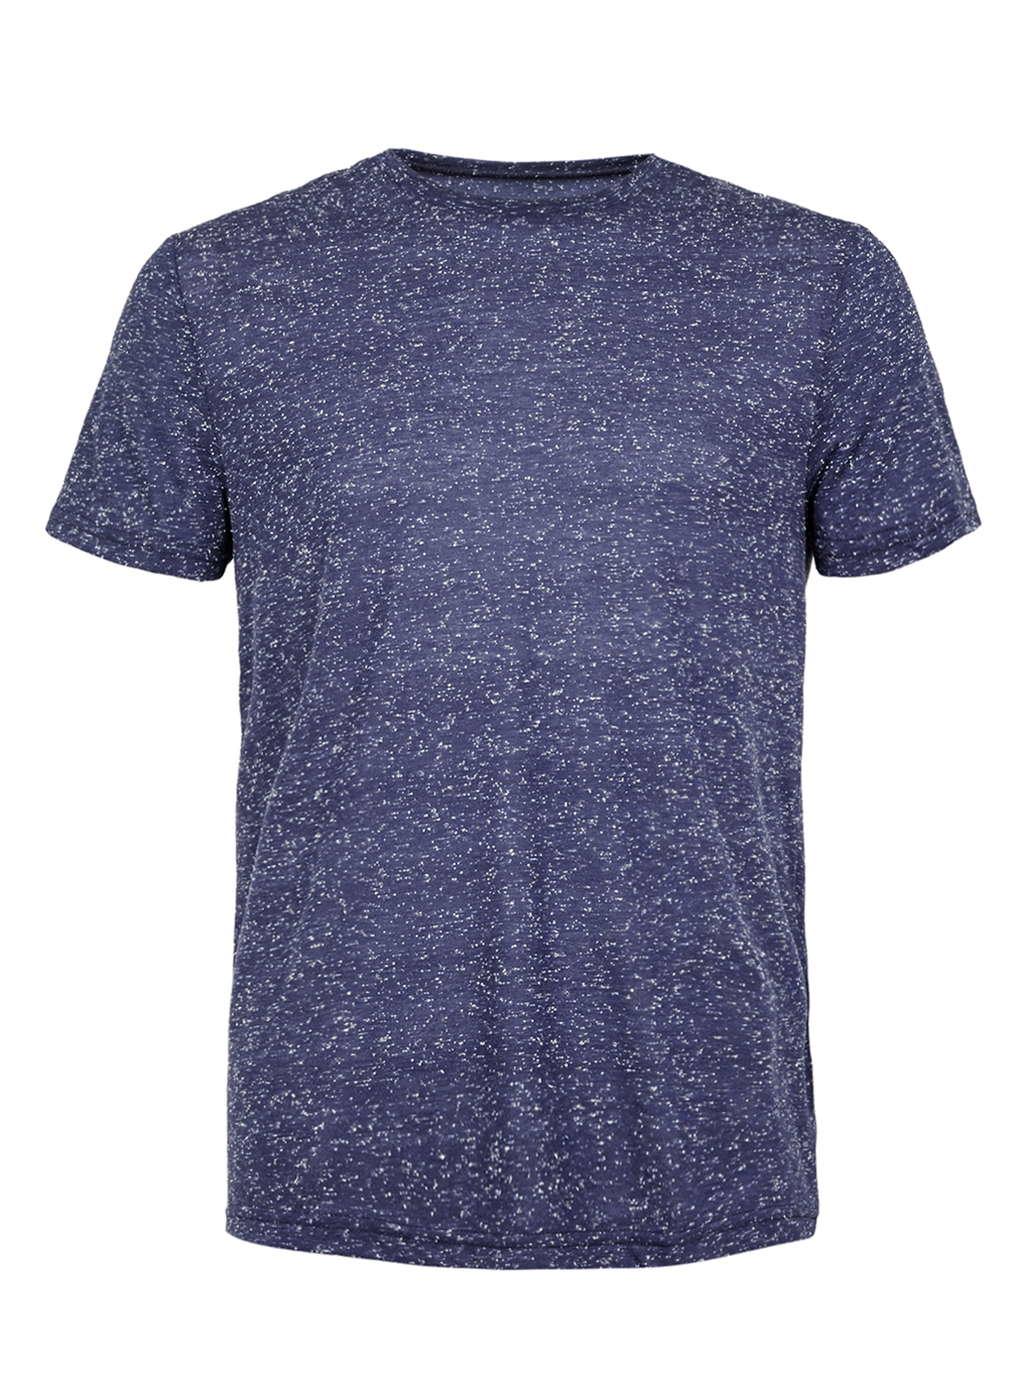 Topman Navy Neppy Slim Fit T Shirt In Blue For Men Lyst